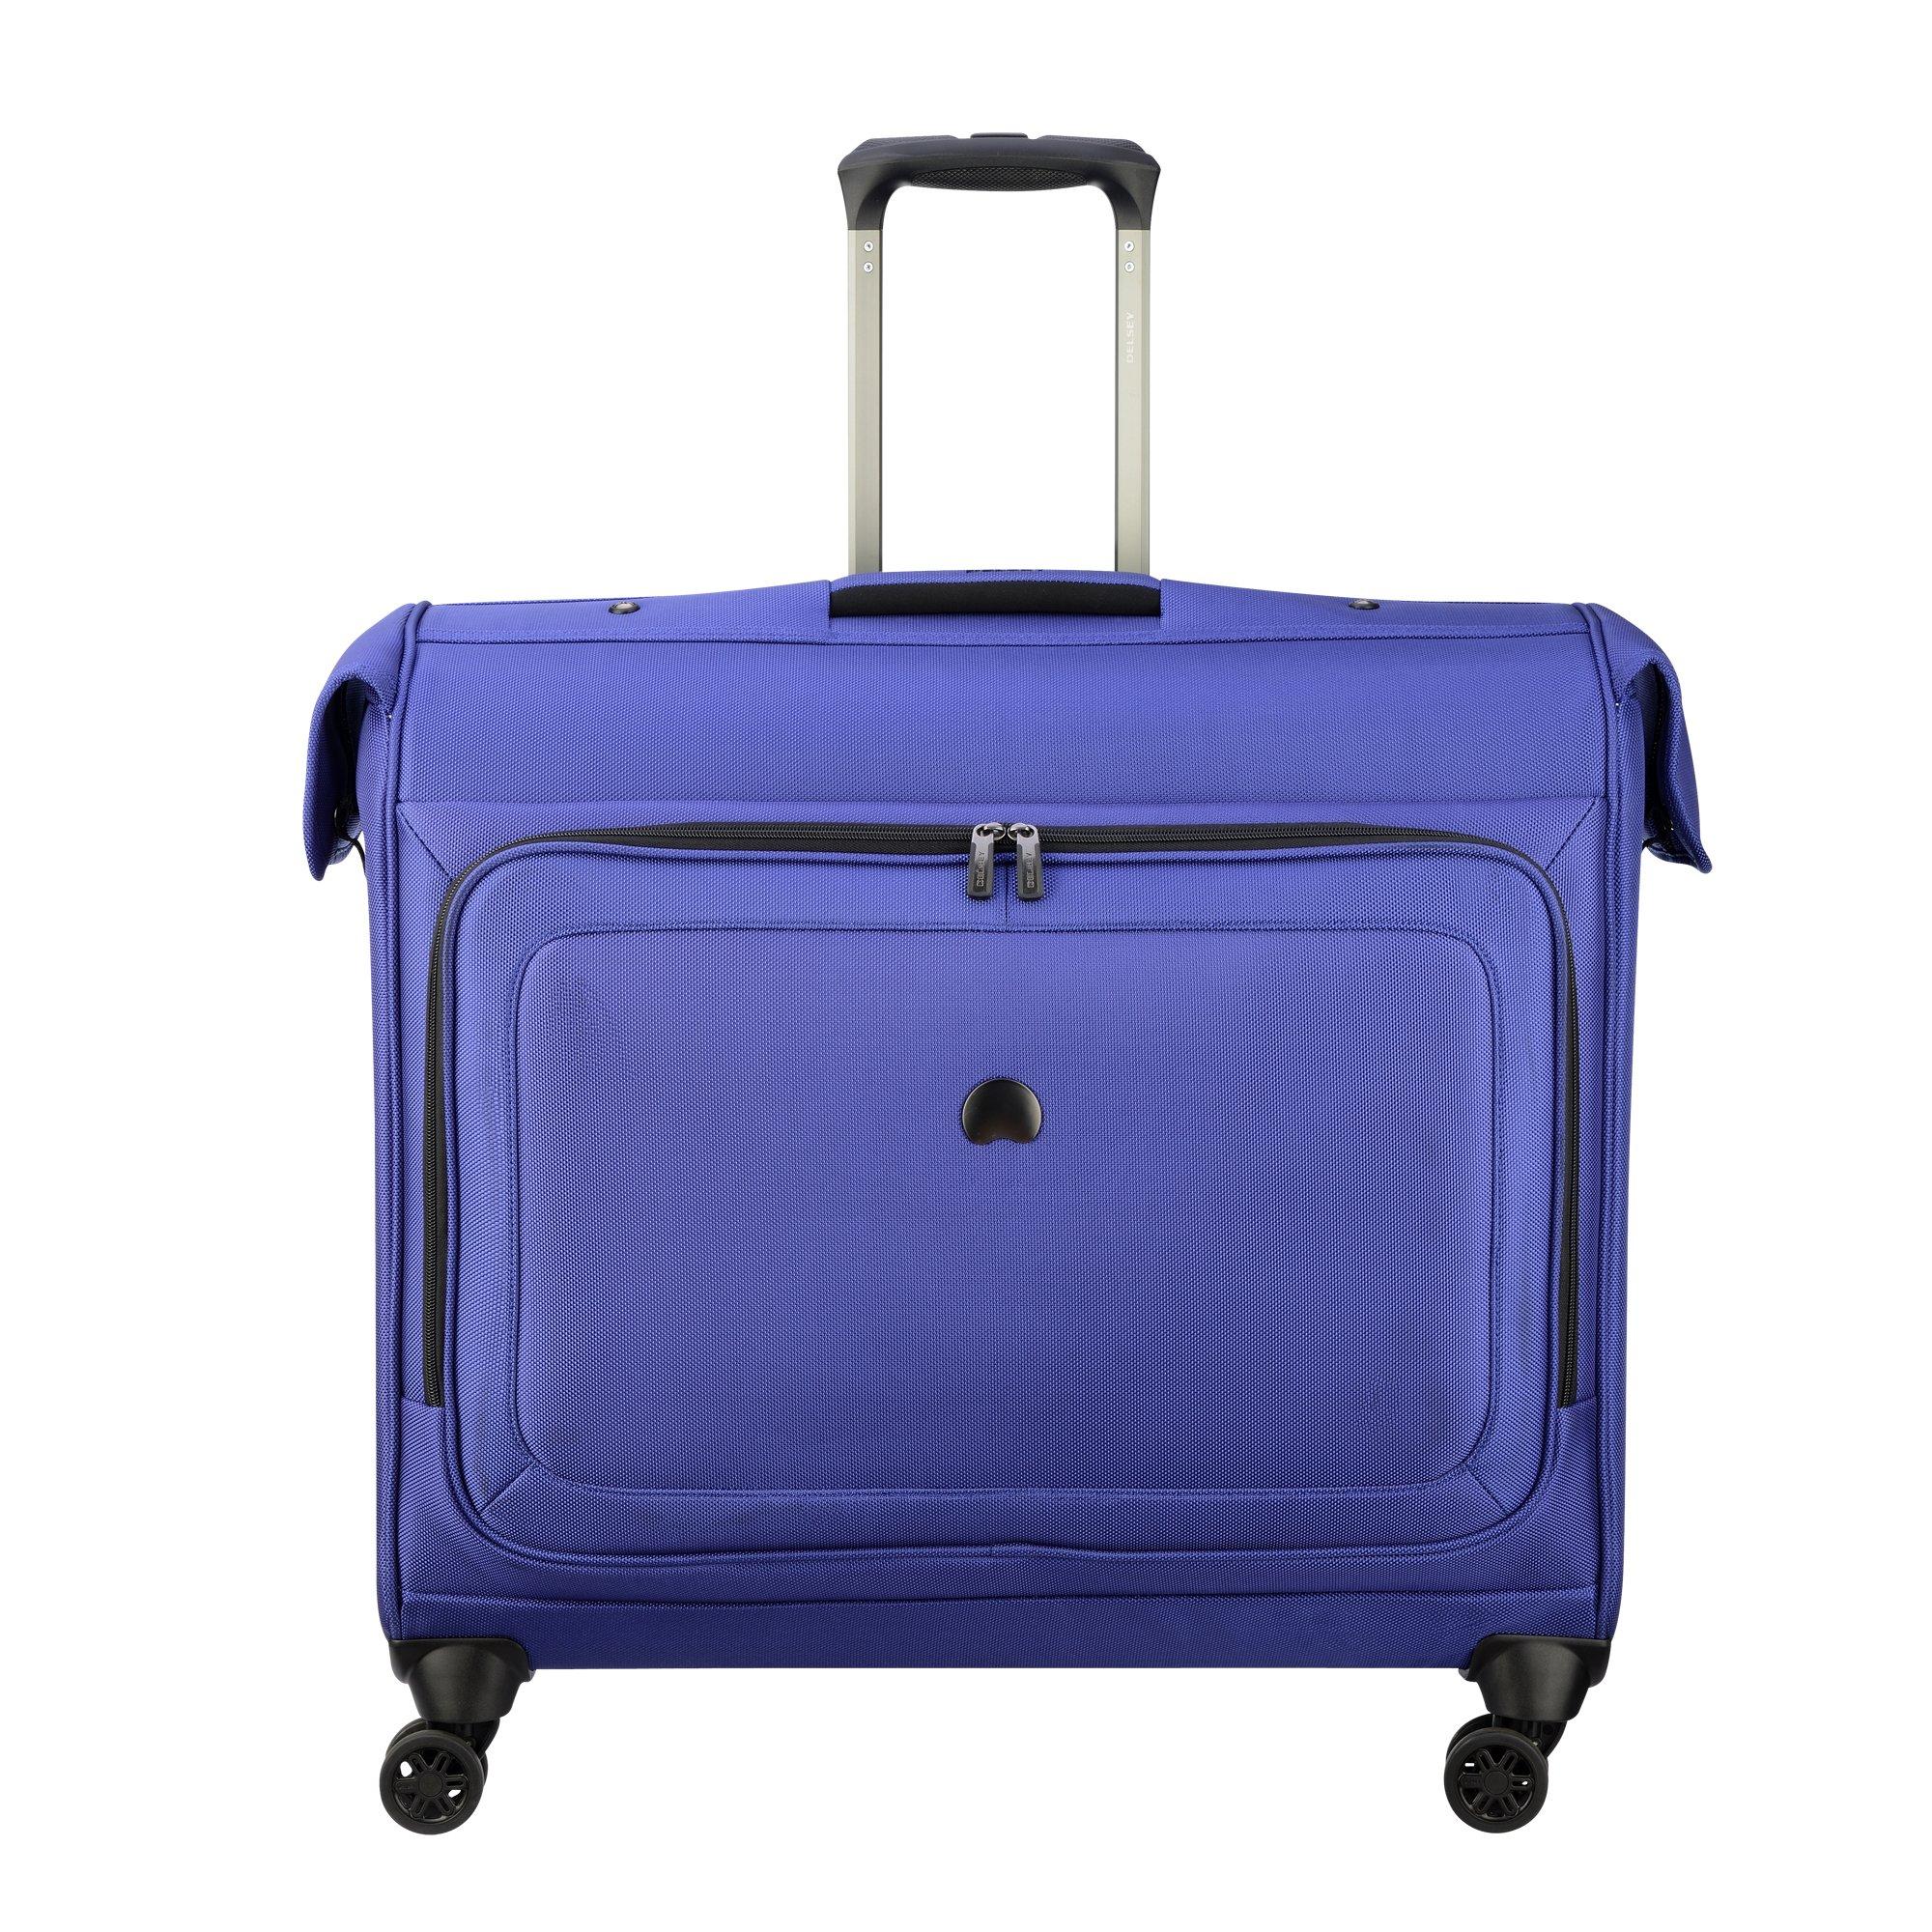 DELSEY Paris Cruise Lite Softside Spinner Trolley Garment Bag, BLUE